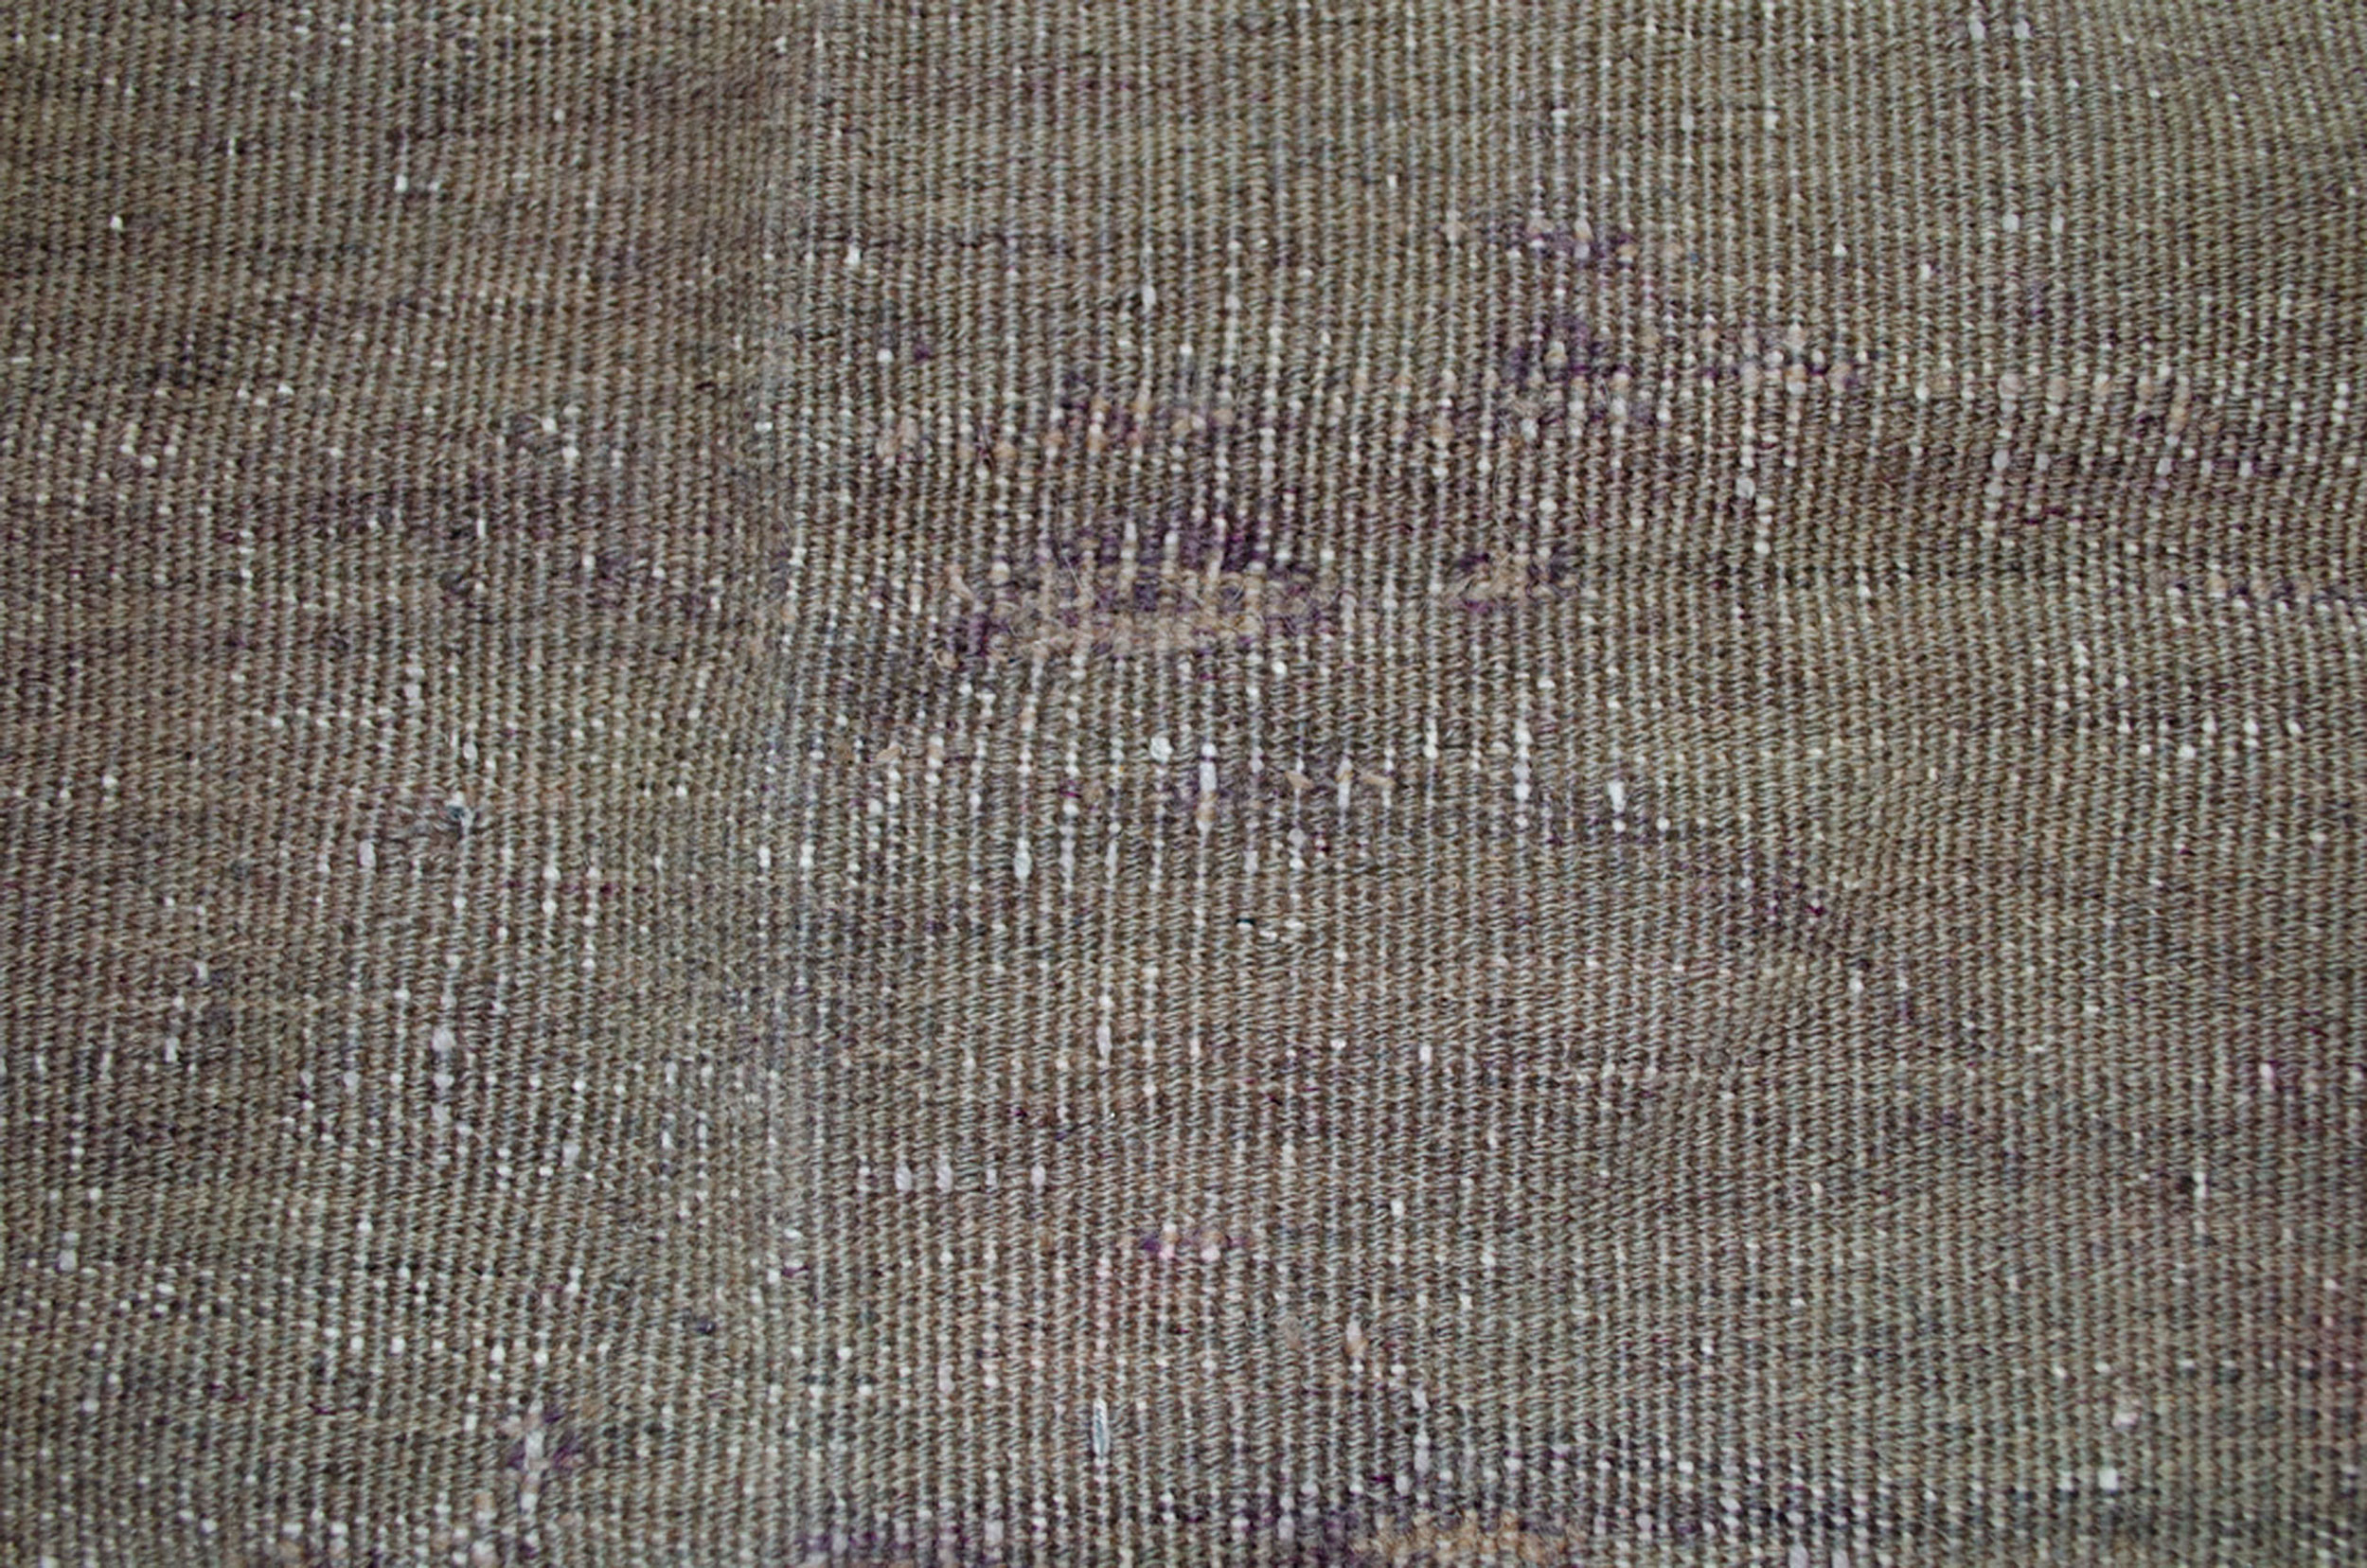 Antique Afshar Sofreh Kilim 110x115cm